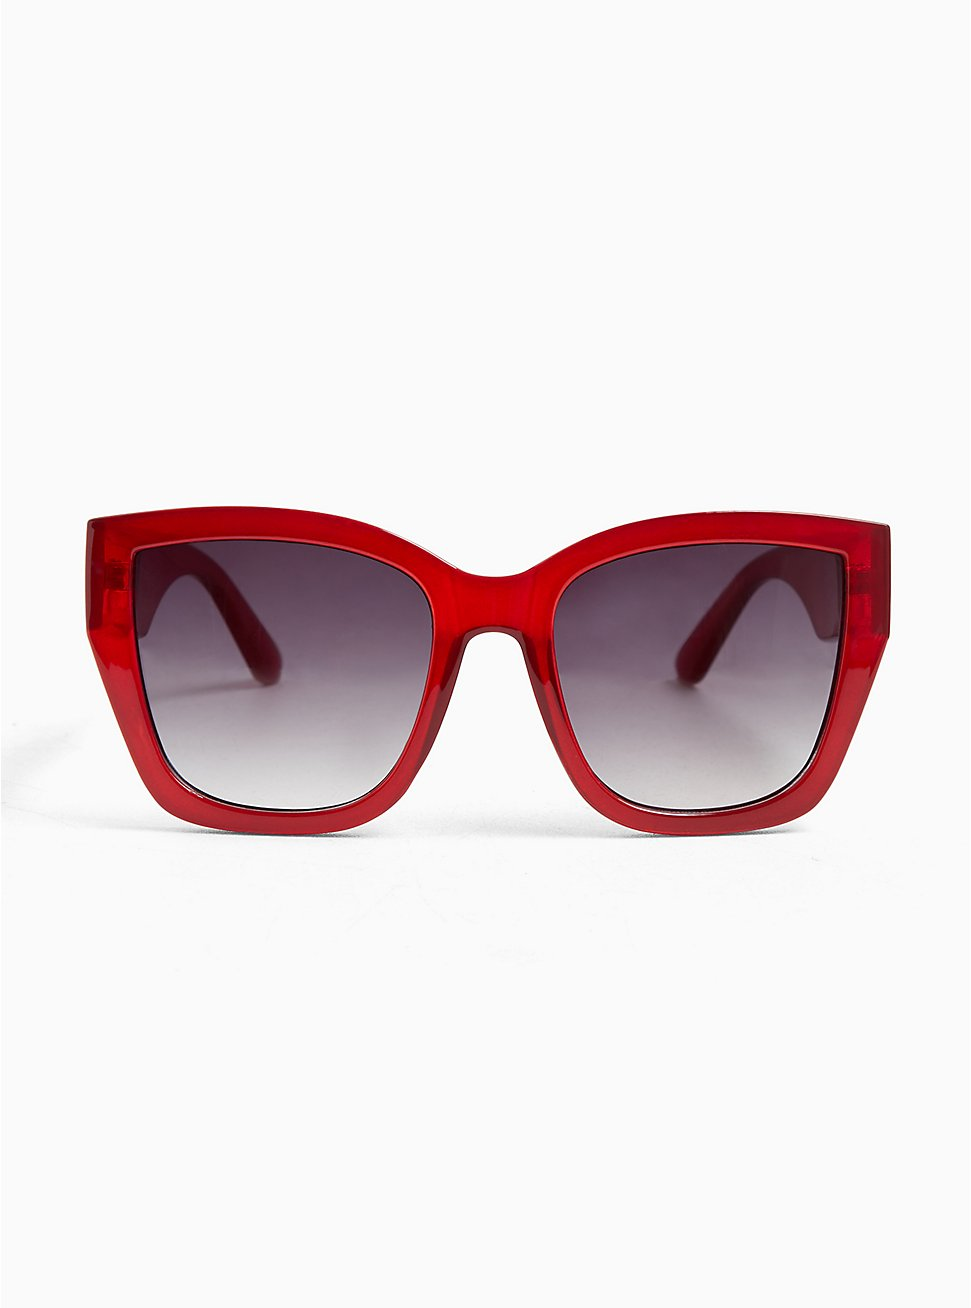 Red Oversized Square Sunglasses, , hi-res